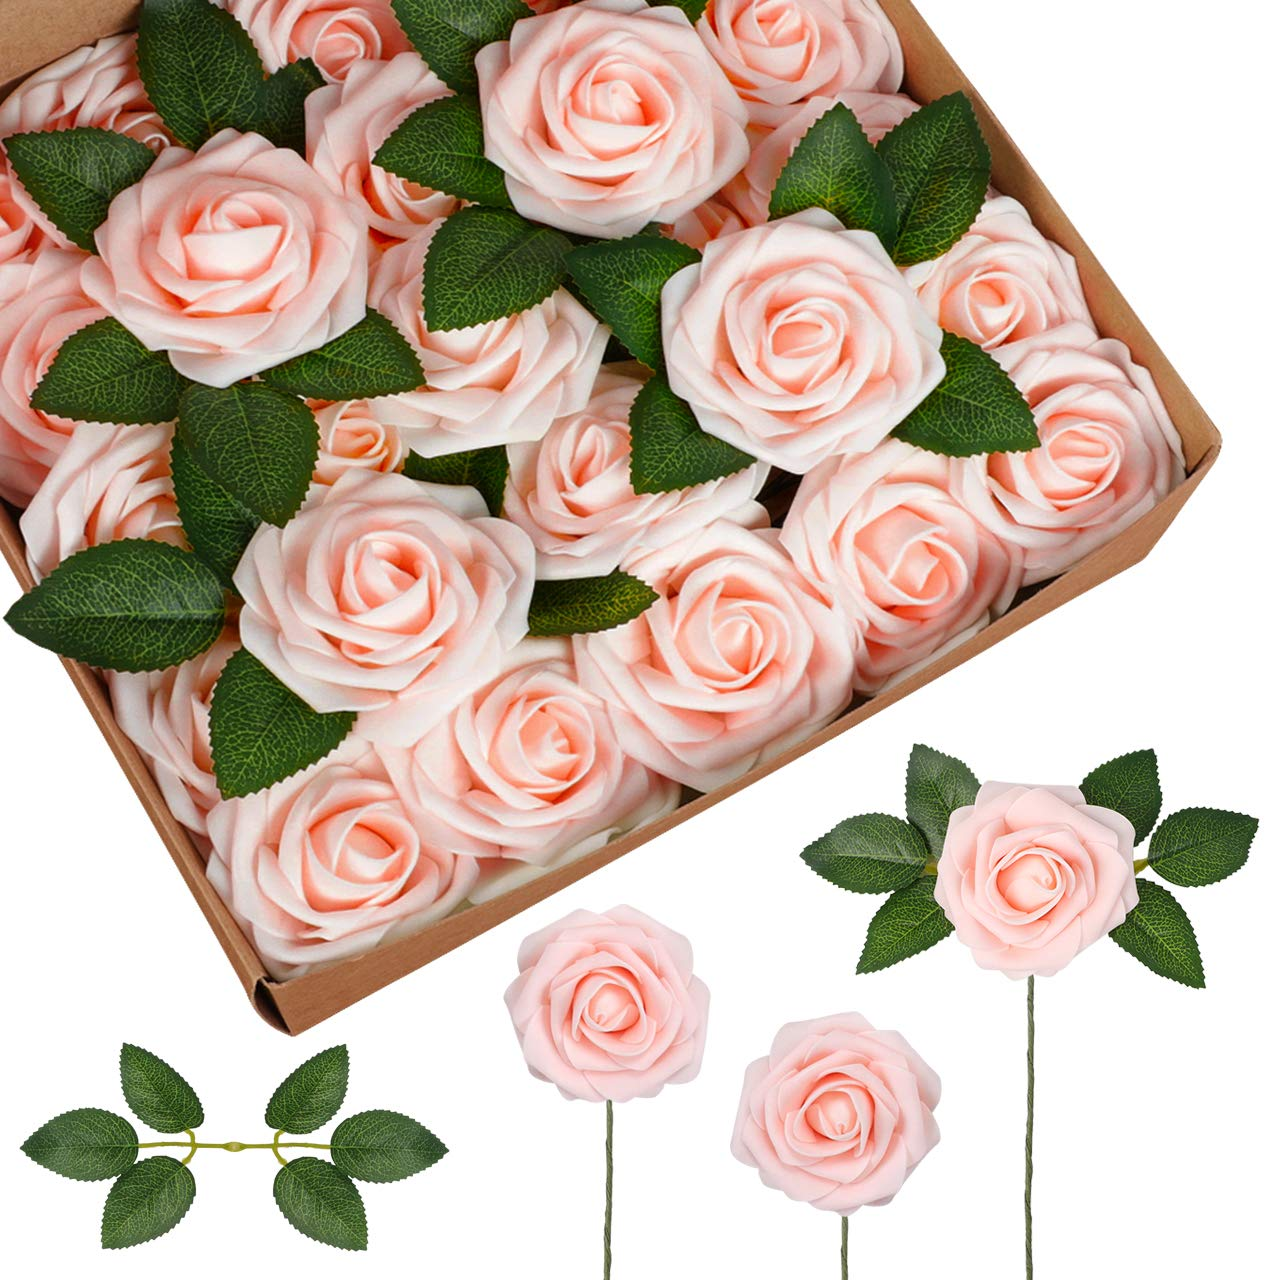 InnoGear Artificial Flowers, 50 Pcs Faux Flowers Fake Flowers Blush Roses Perfect for DIY Wedding Bouquets Centerpieces Bridal Shower Party Home Flower Arrangement Decorations